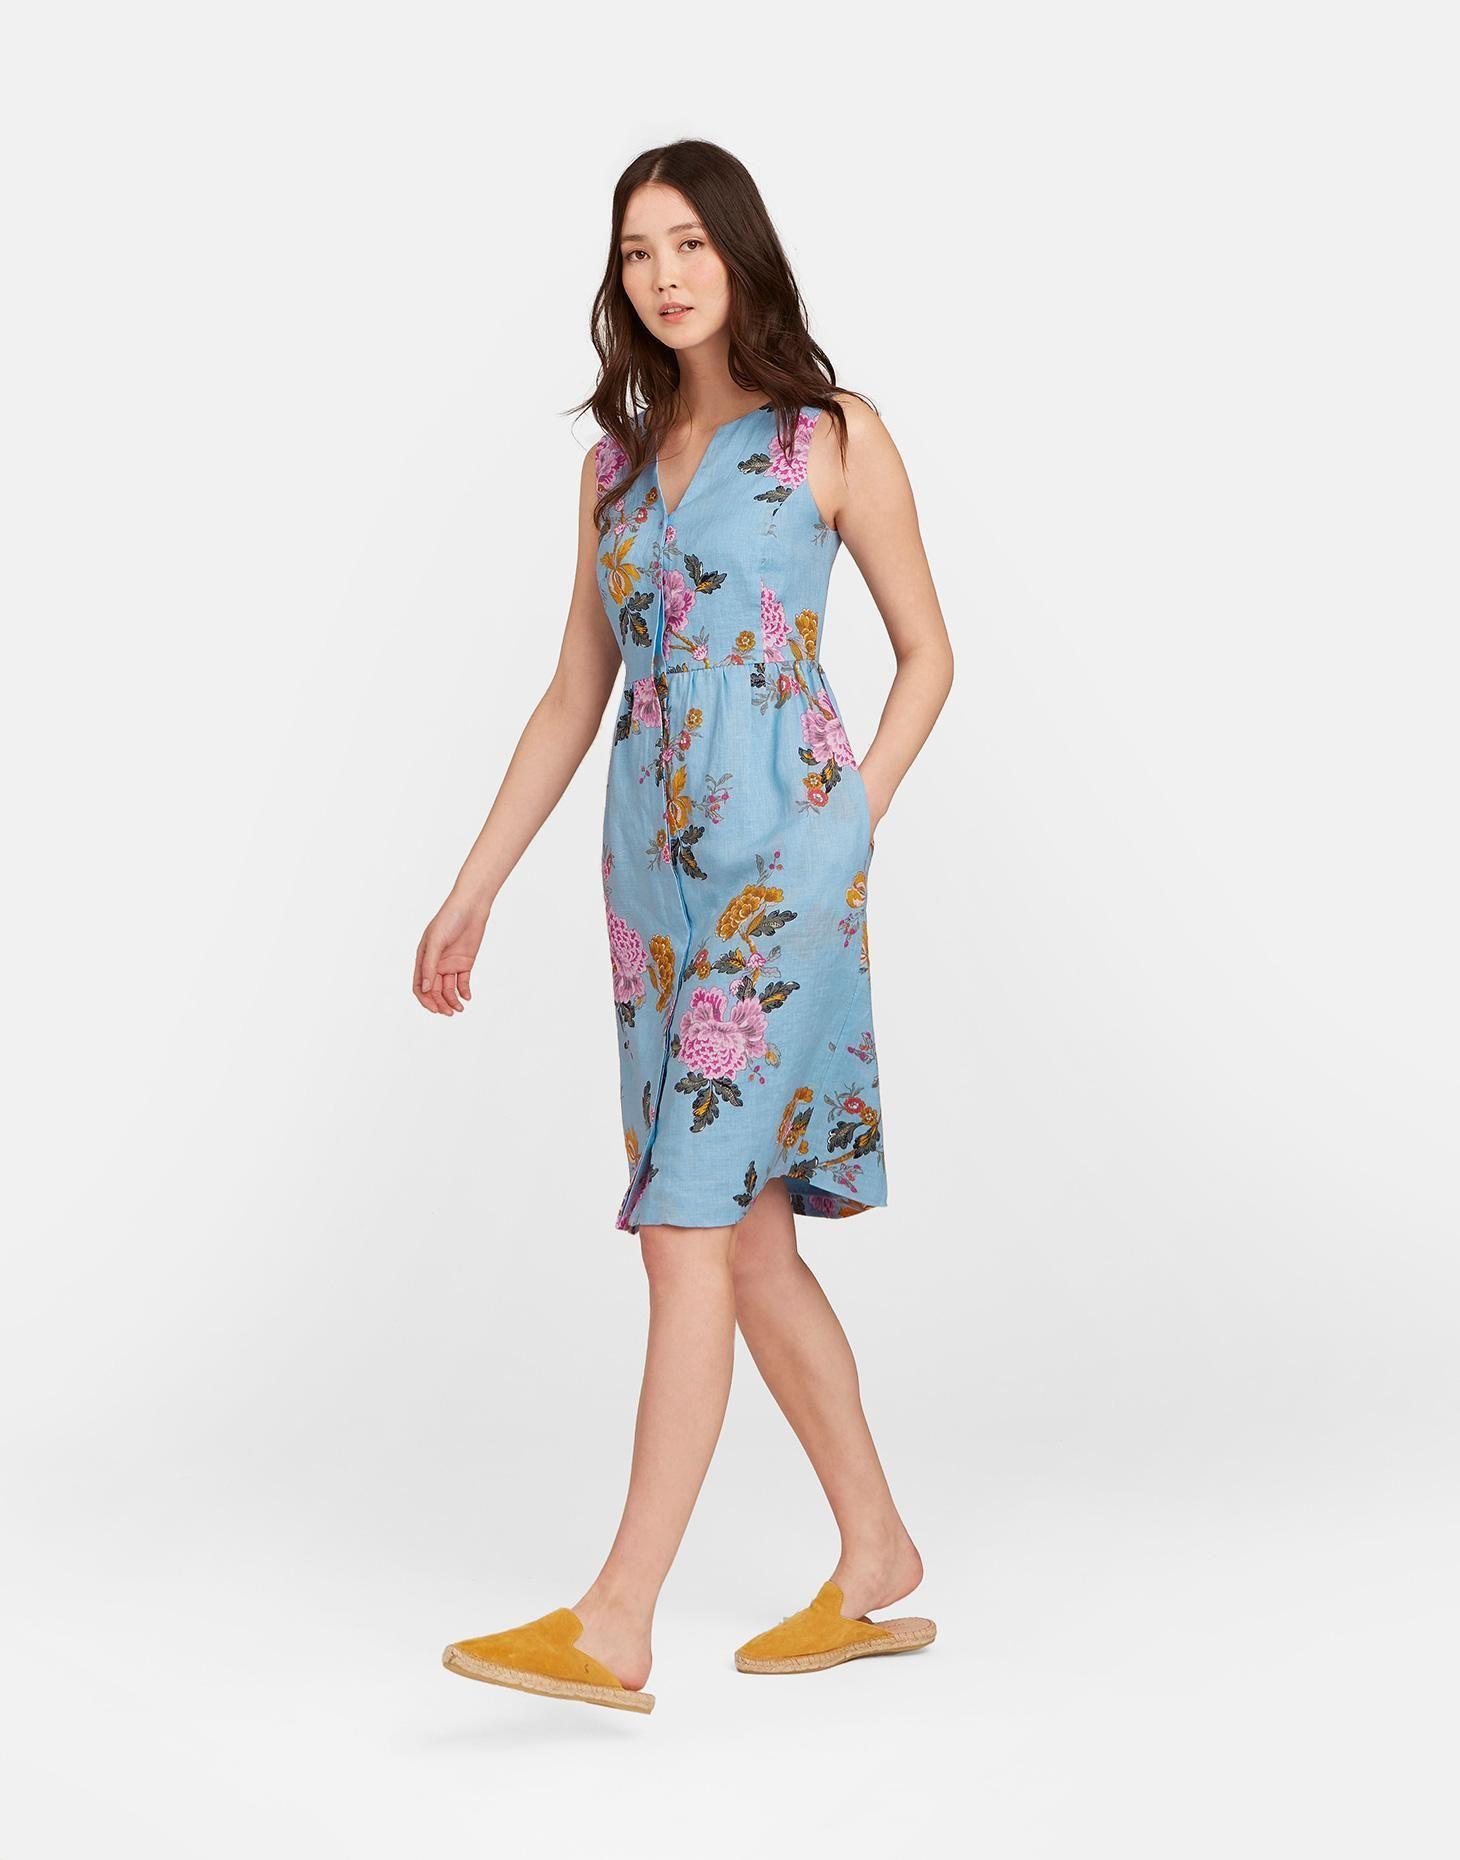 eaa020647b1 Lisia LIGHT BLUE CHINOISE Sleeveless Button Down Linen Dress ...